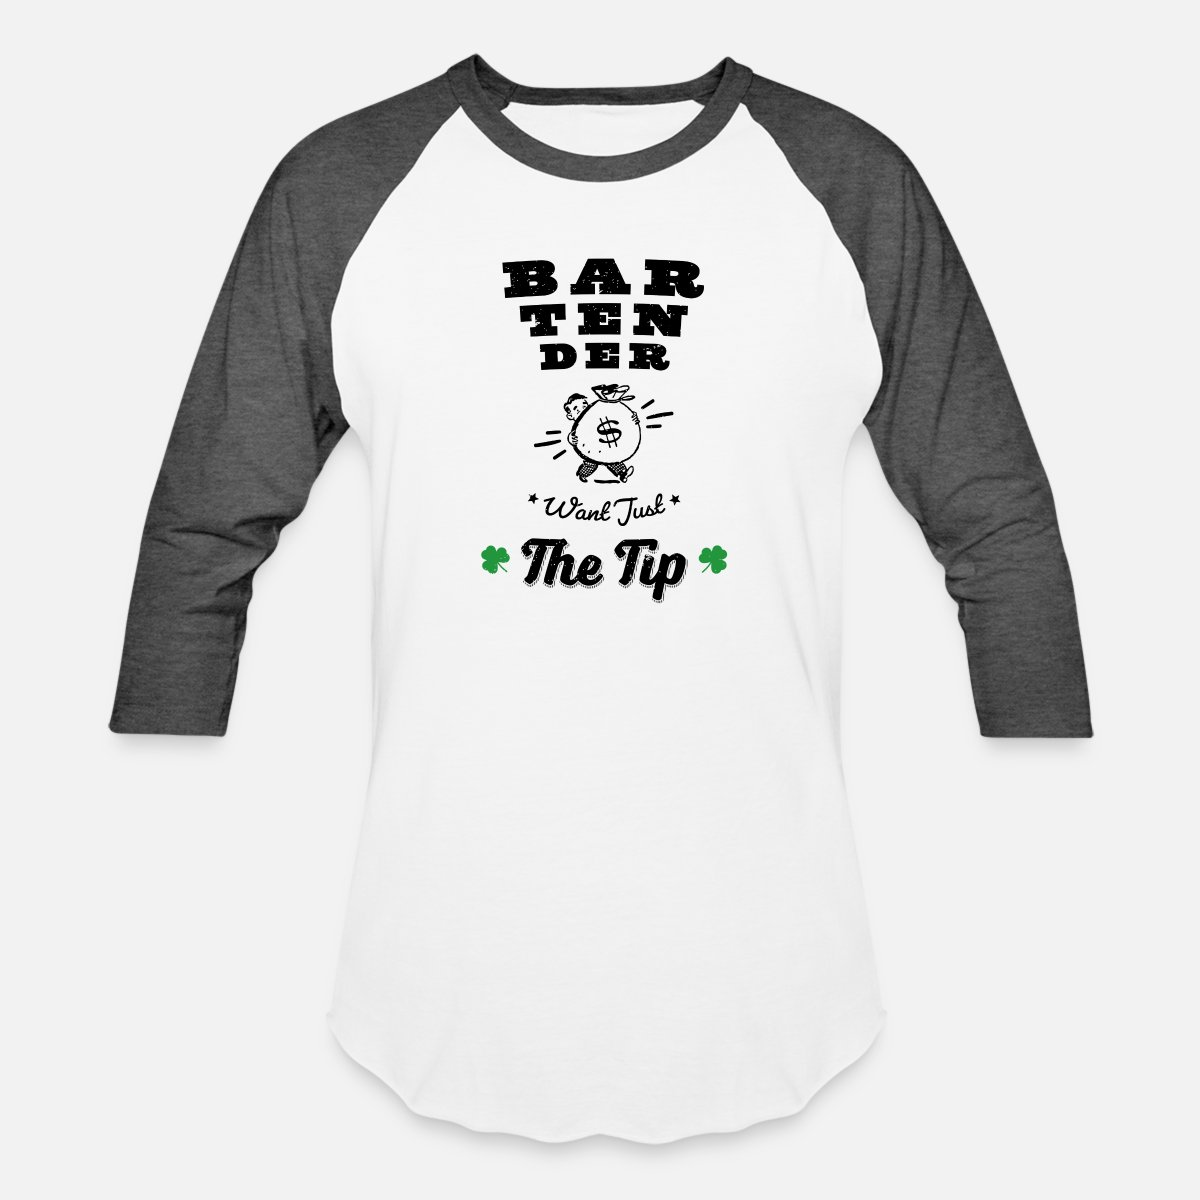 2b257a69 Clever Irish Sayings For Shirts | Top Mode Depot